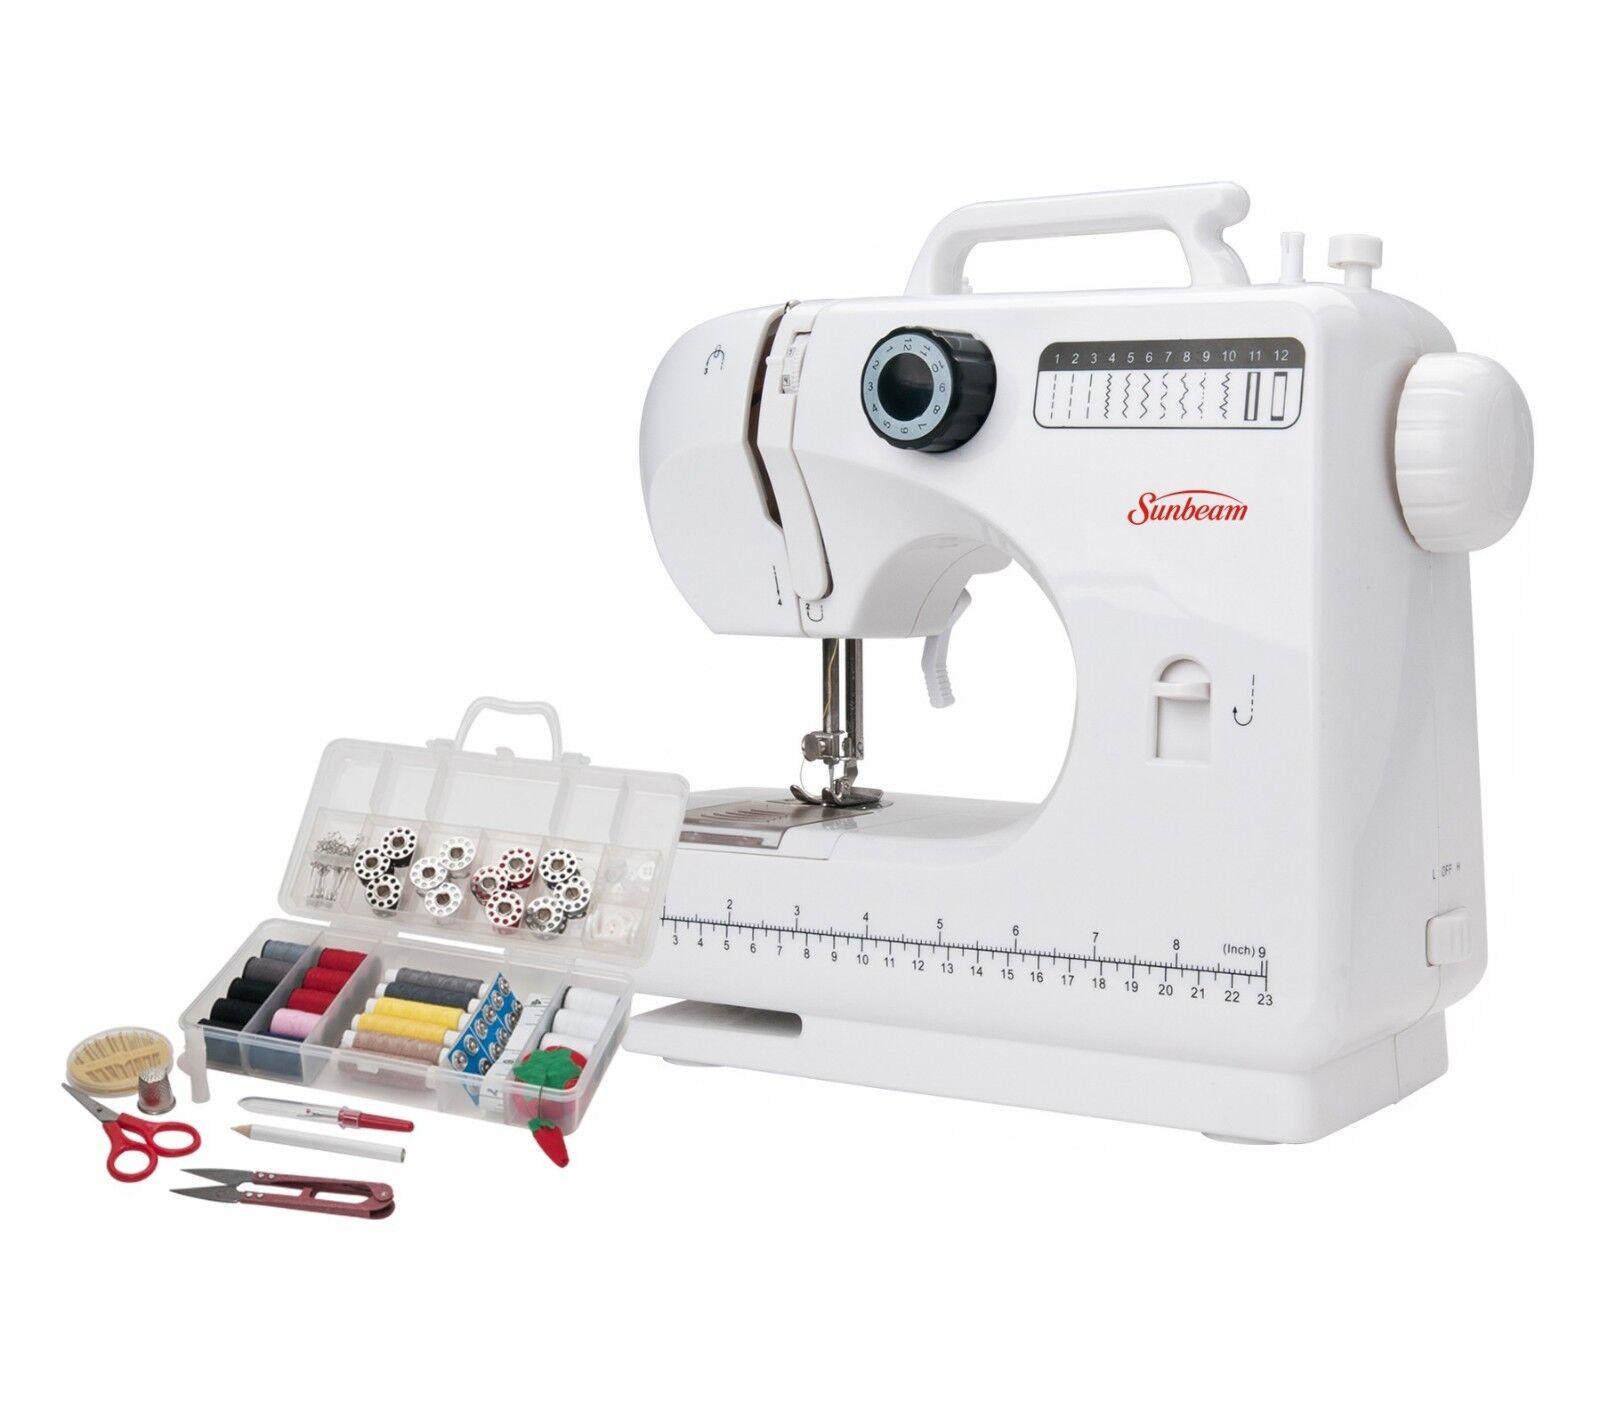 Sunbeam 12-Stitch Compact Sewing Machine, SB1818